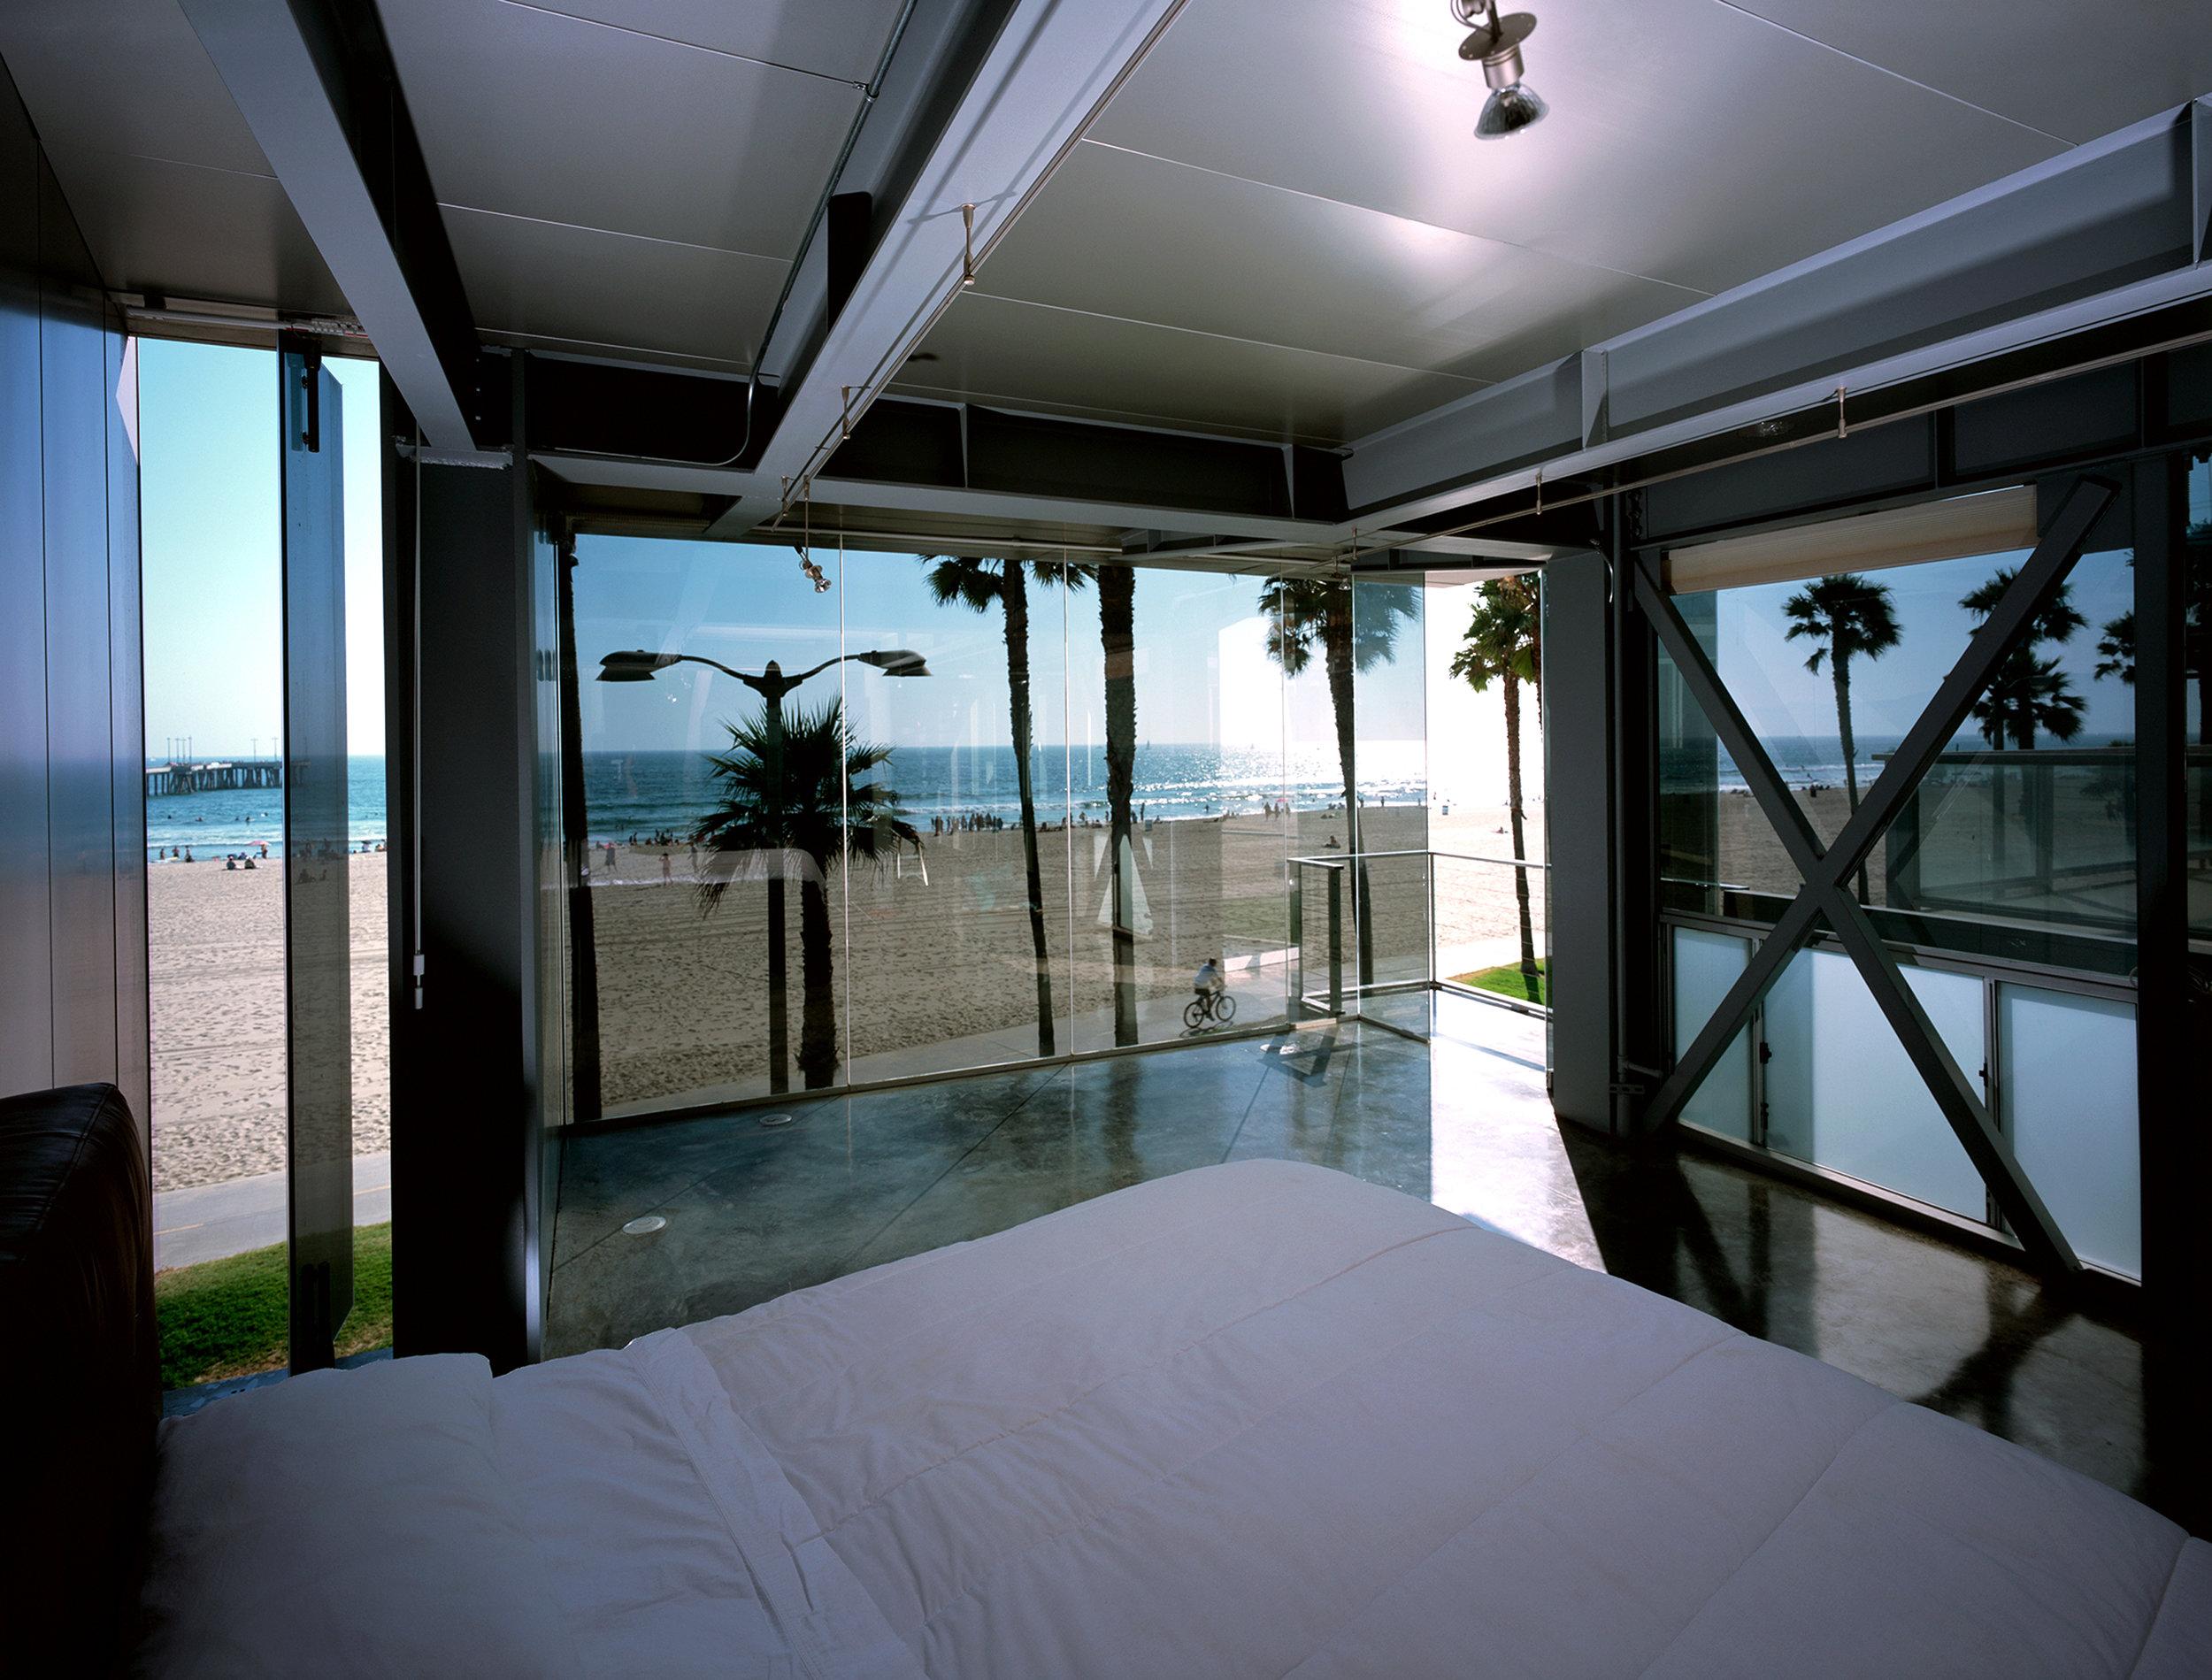 S.E.A.-Studio-Environmental-Architecture-David-Hertz-FAIA-Panel-House-Venice-Beach-California-sustainable-regenerative-restorative-green-design-prefabricated-aluminum-refrigeration-open-concept-ocean-view-residential-glass-steel-sunset-interior-7.jpg